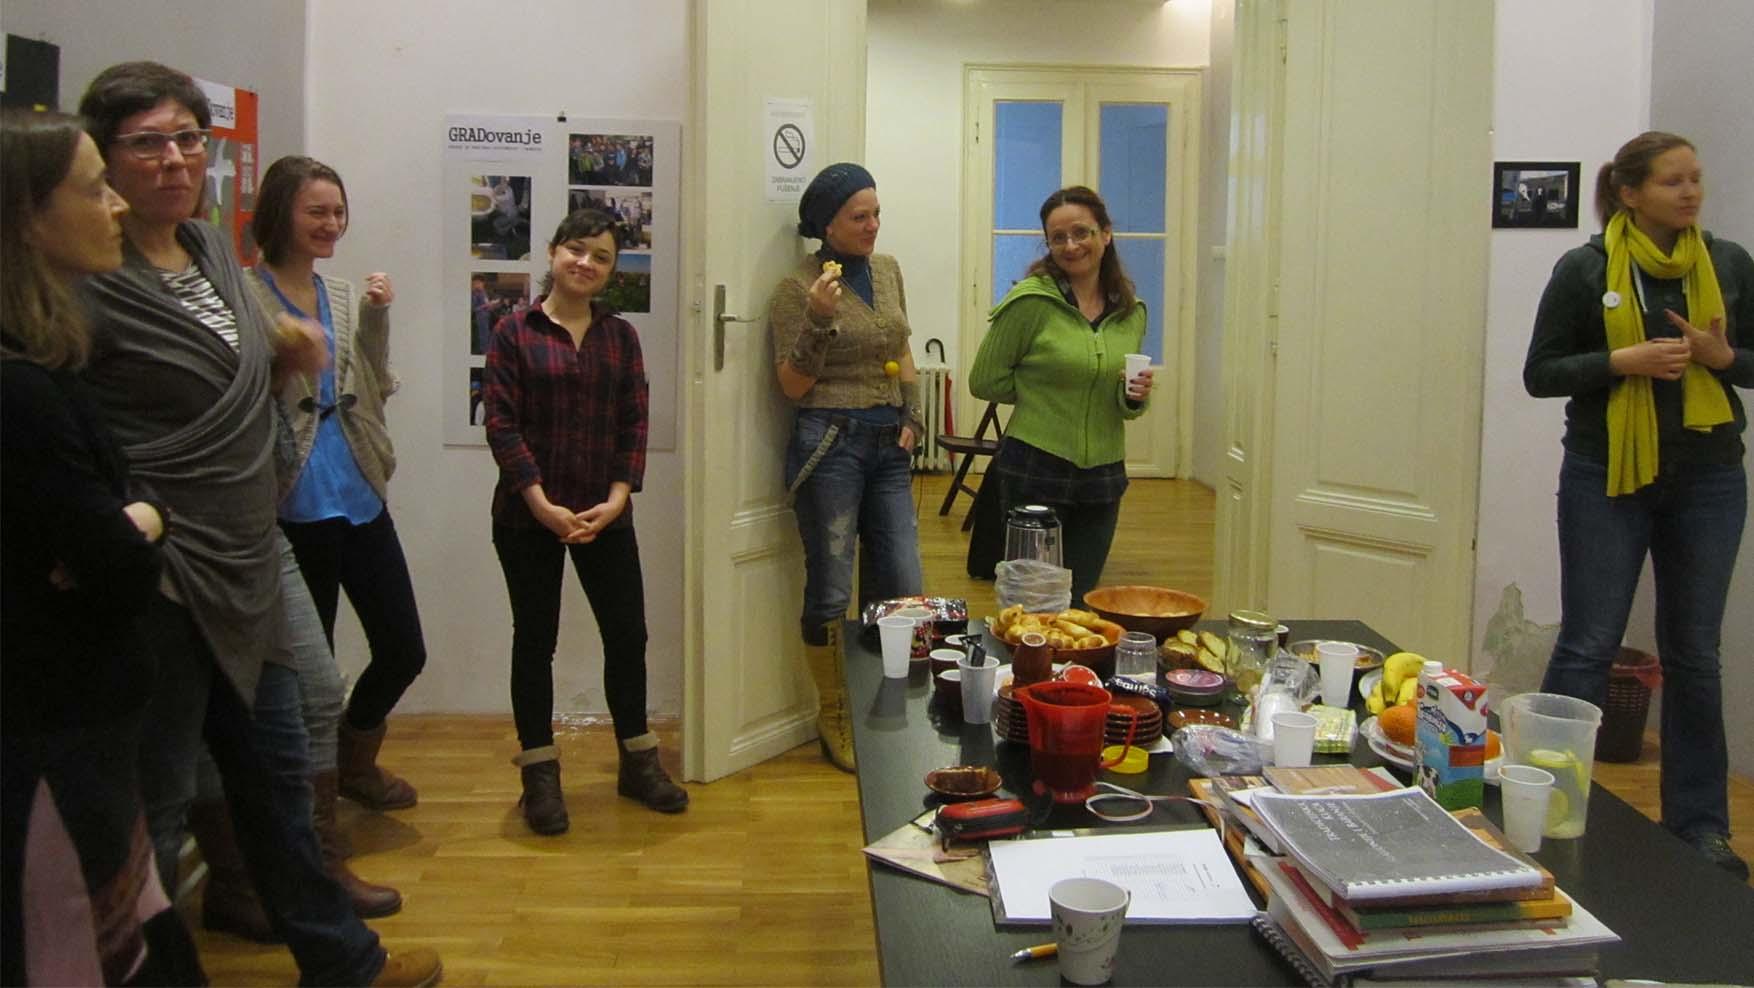 12 DANS kurs zemljane arhitekture gRUPA